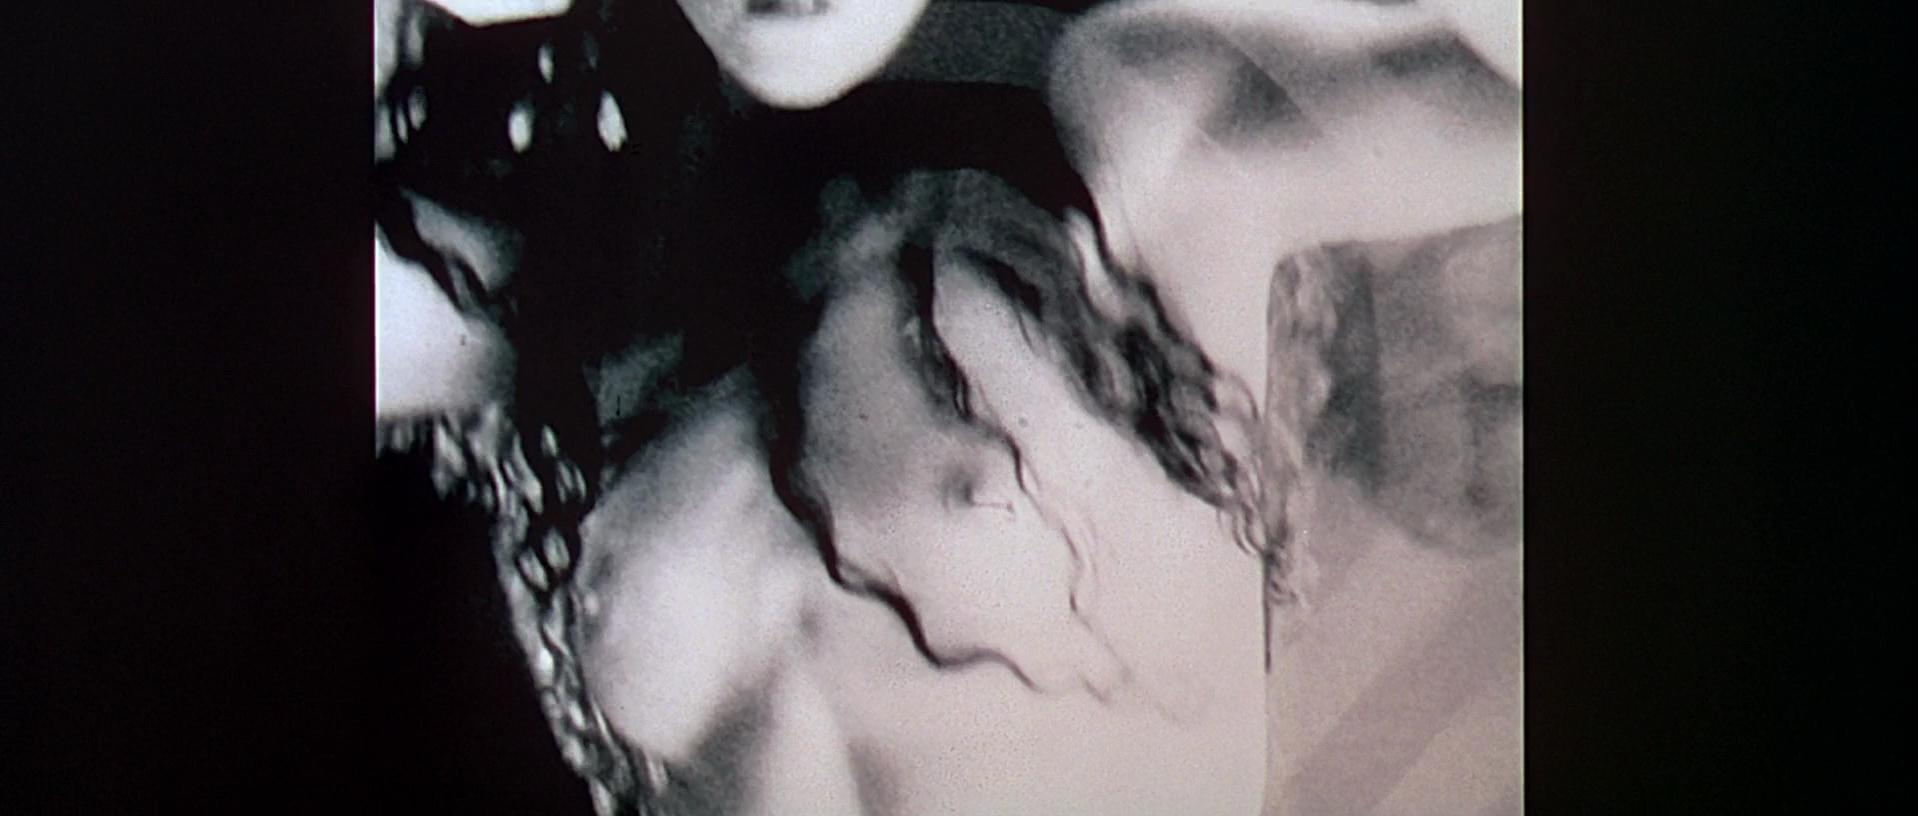 Emily browning nude scene scandalplanetcom - 2 10